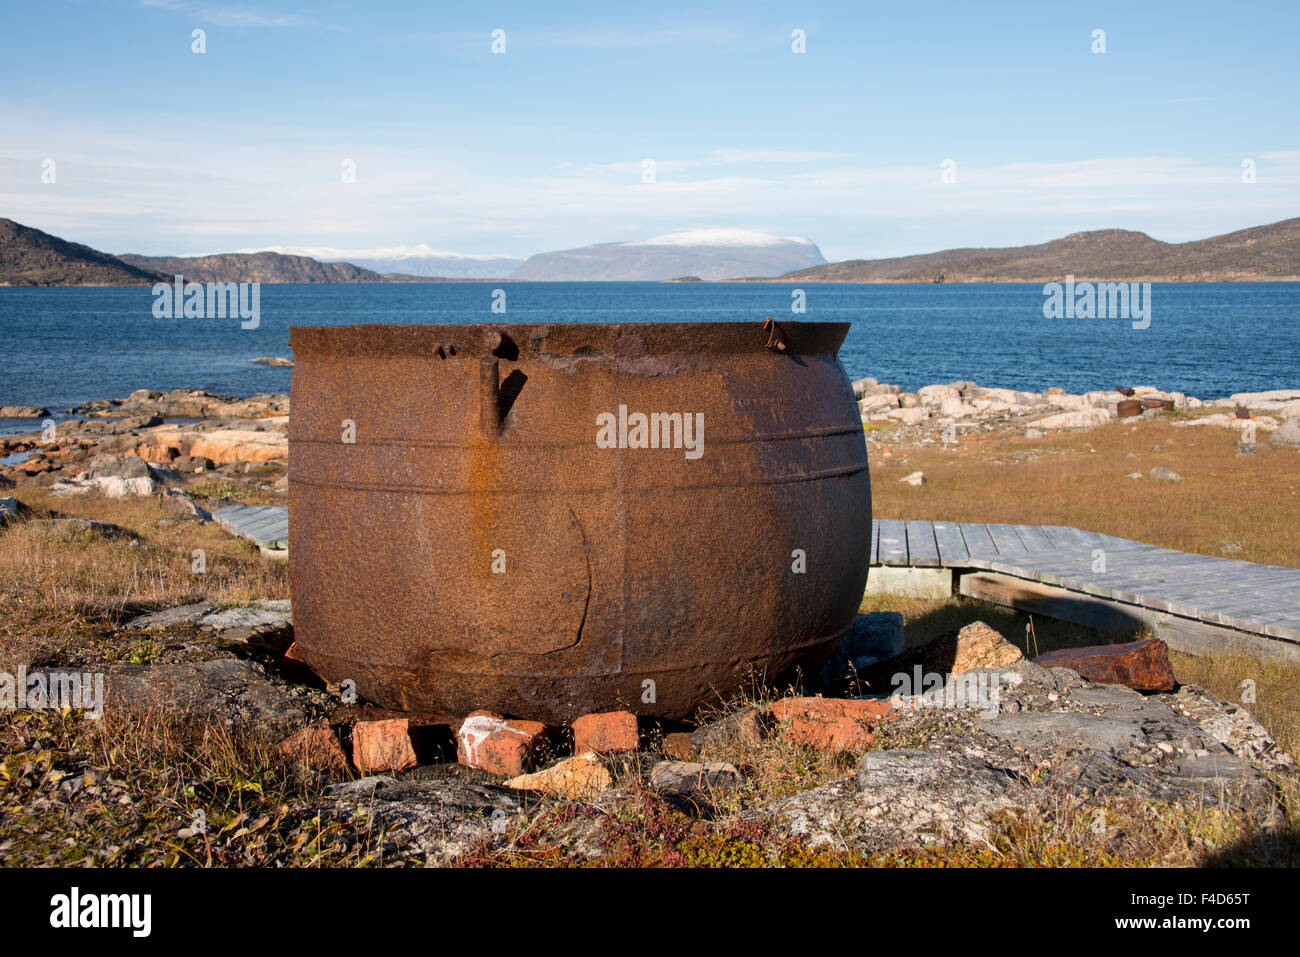 Canada, Nunavut, Qikiqtaaluk Region, Kekerten Island. Kekerten Historic Park preserving whaling artifacts. Whale - Stock Image